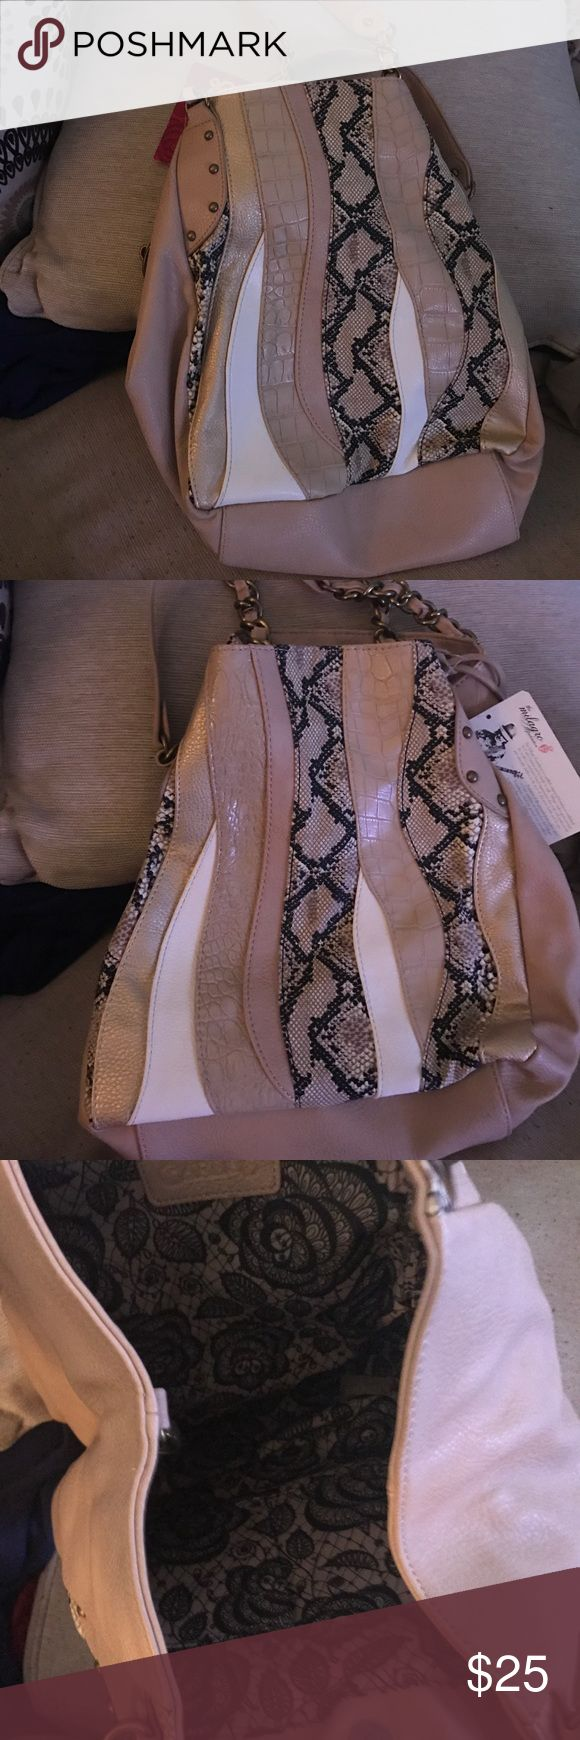 Carlos Santana pink handbag Beautiful handbag. Great for spring and summer. Great color . I promise you will get tons of compliments Carlos Santana Bags Shoulder Bags